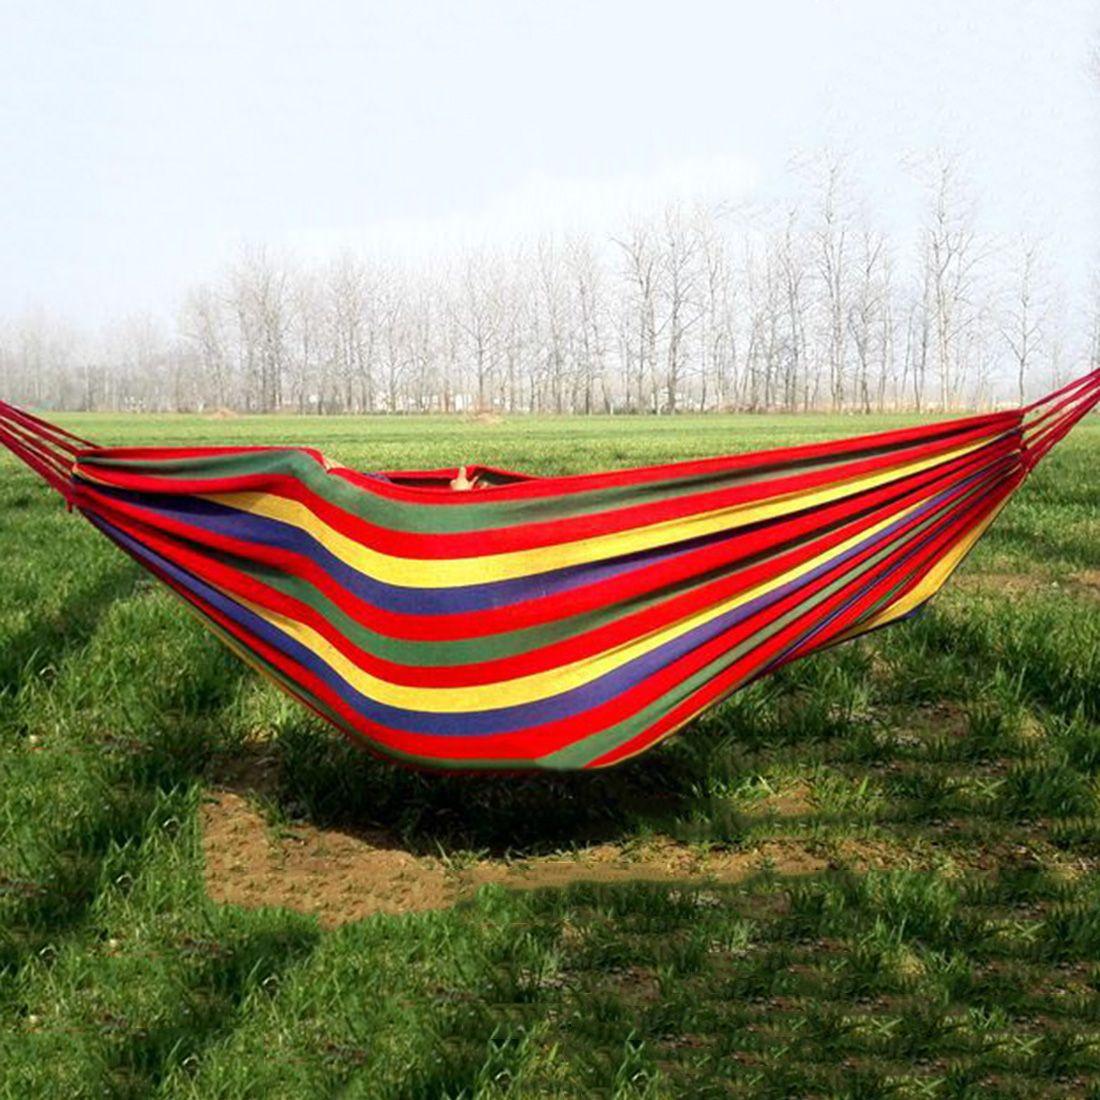 Outdoors Portable Camping Parachute Sleeping Double Hammock Garden Swing Hammock Hanging Bed Travel Camping Swing Canvas Stripe Sleeping Bags